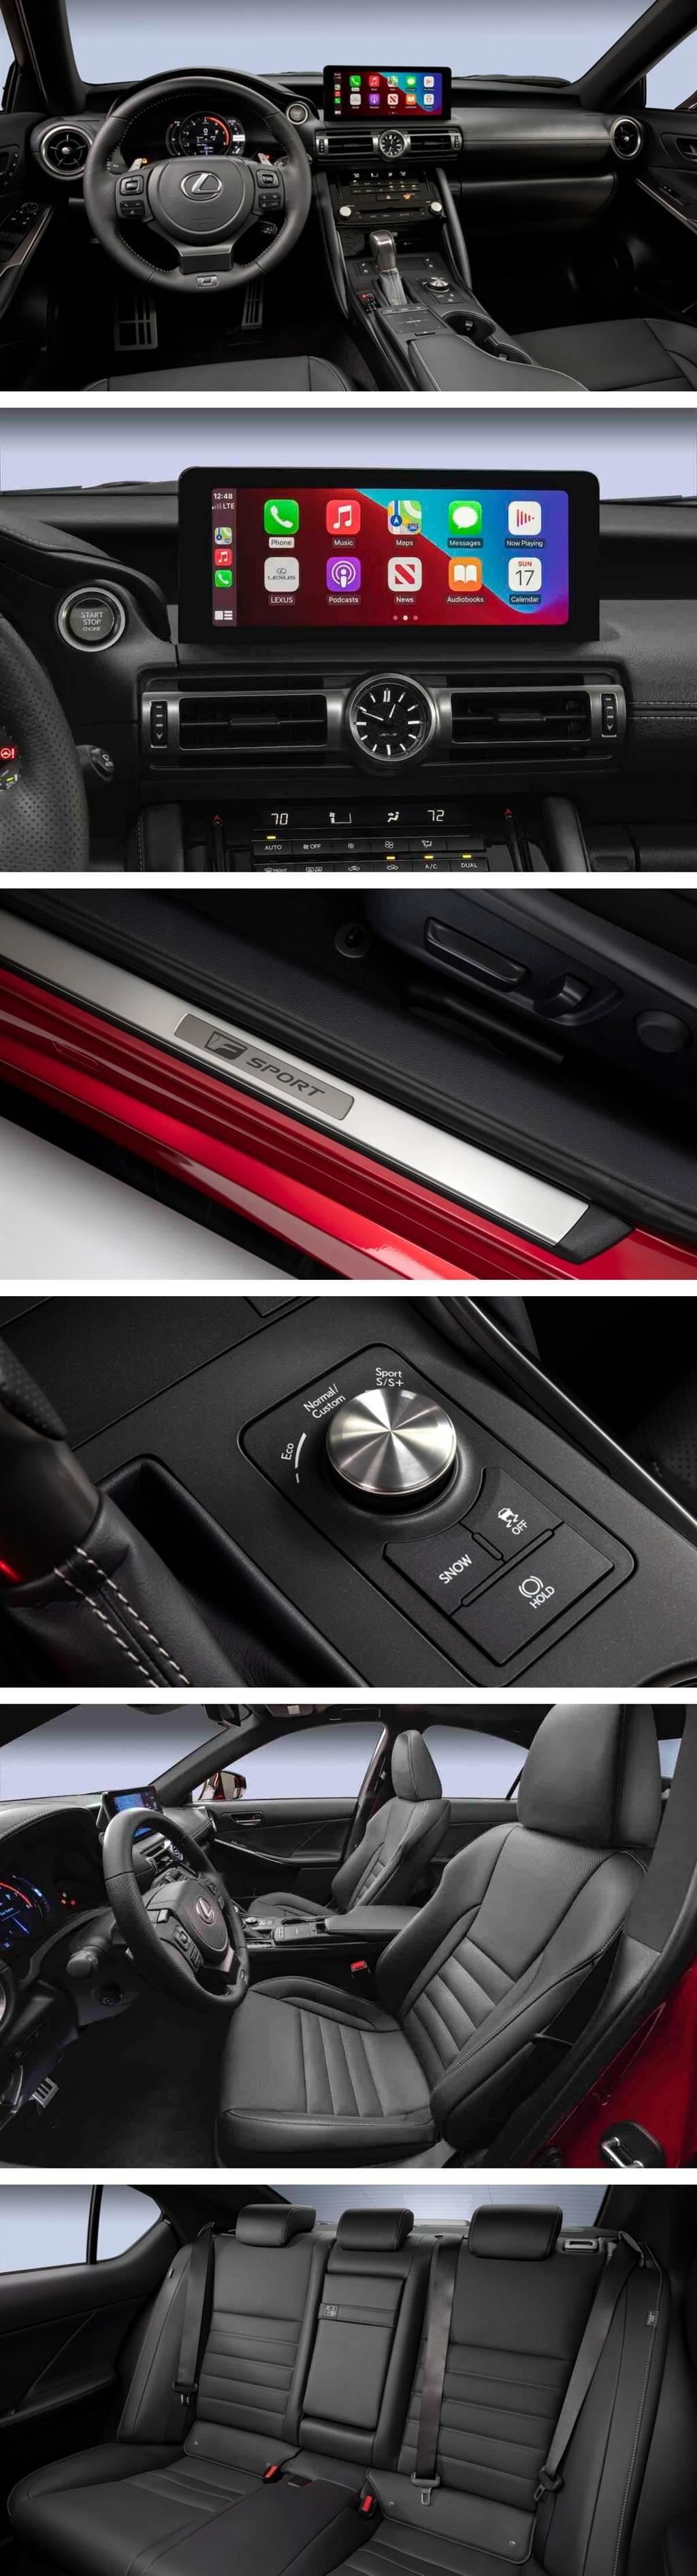 V8 回歸,不過卻是以內斂的方式呈現!Lexus IS 500 F SPORT Performance 正式亮相!